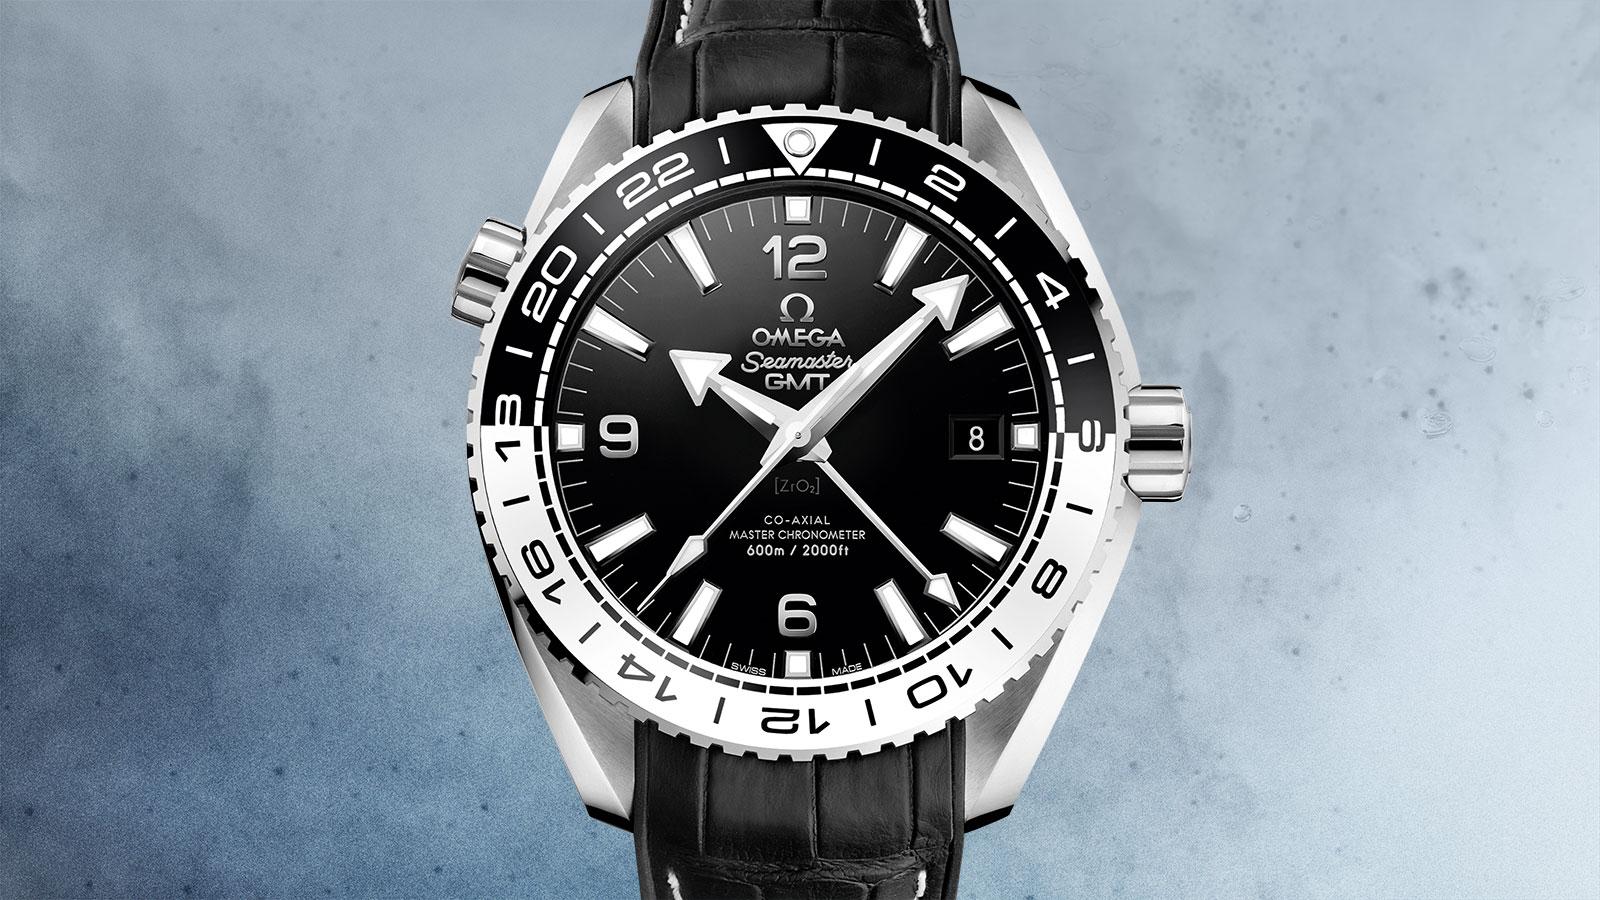 Seamaster 海洋宇宙600米腕表 海洋宇宙600米 欧米茄GMT同轴至臻天文台表43.5毫米 腕表 - 215.33.44.22.01.001